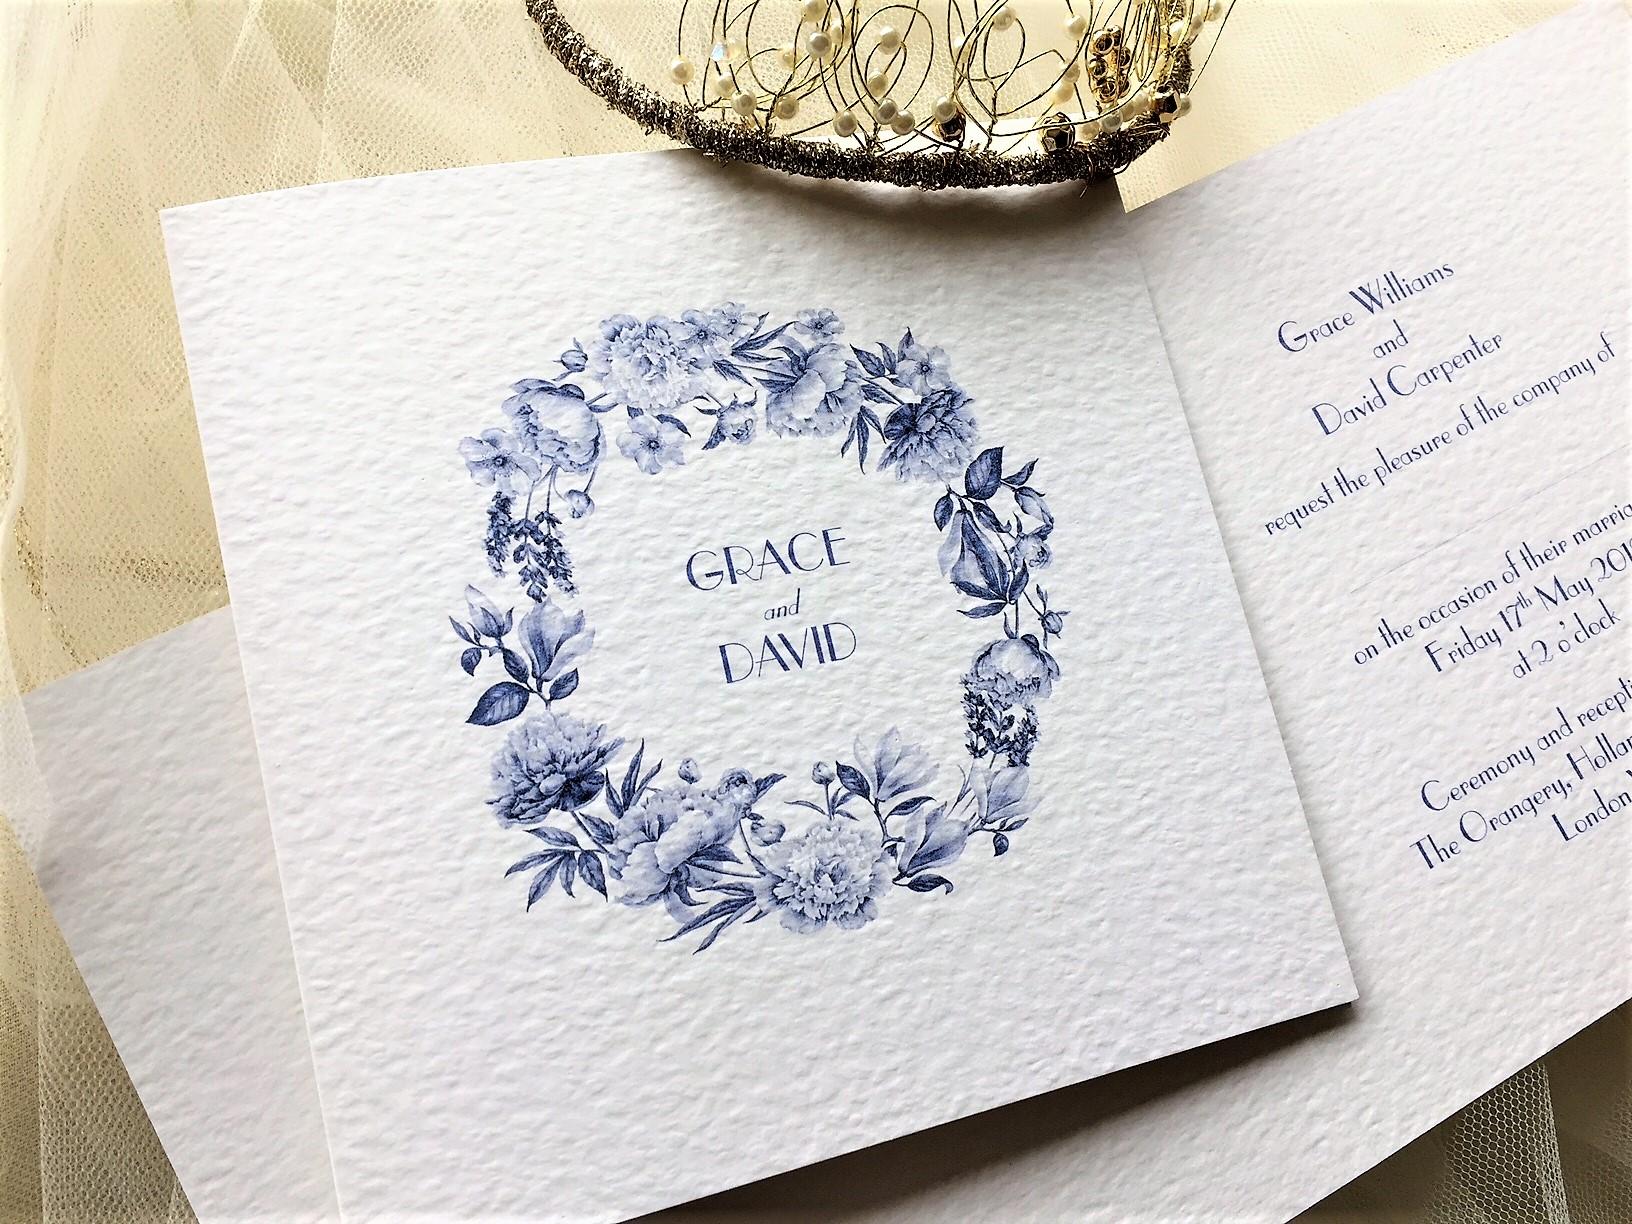 When Do You Order Wedding Invitations: Royal Blue Wedding Invitations